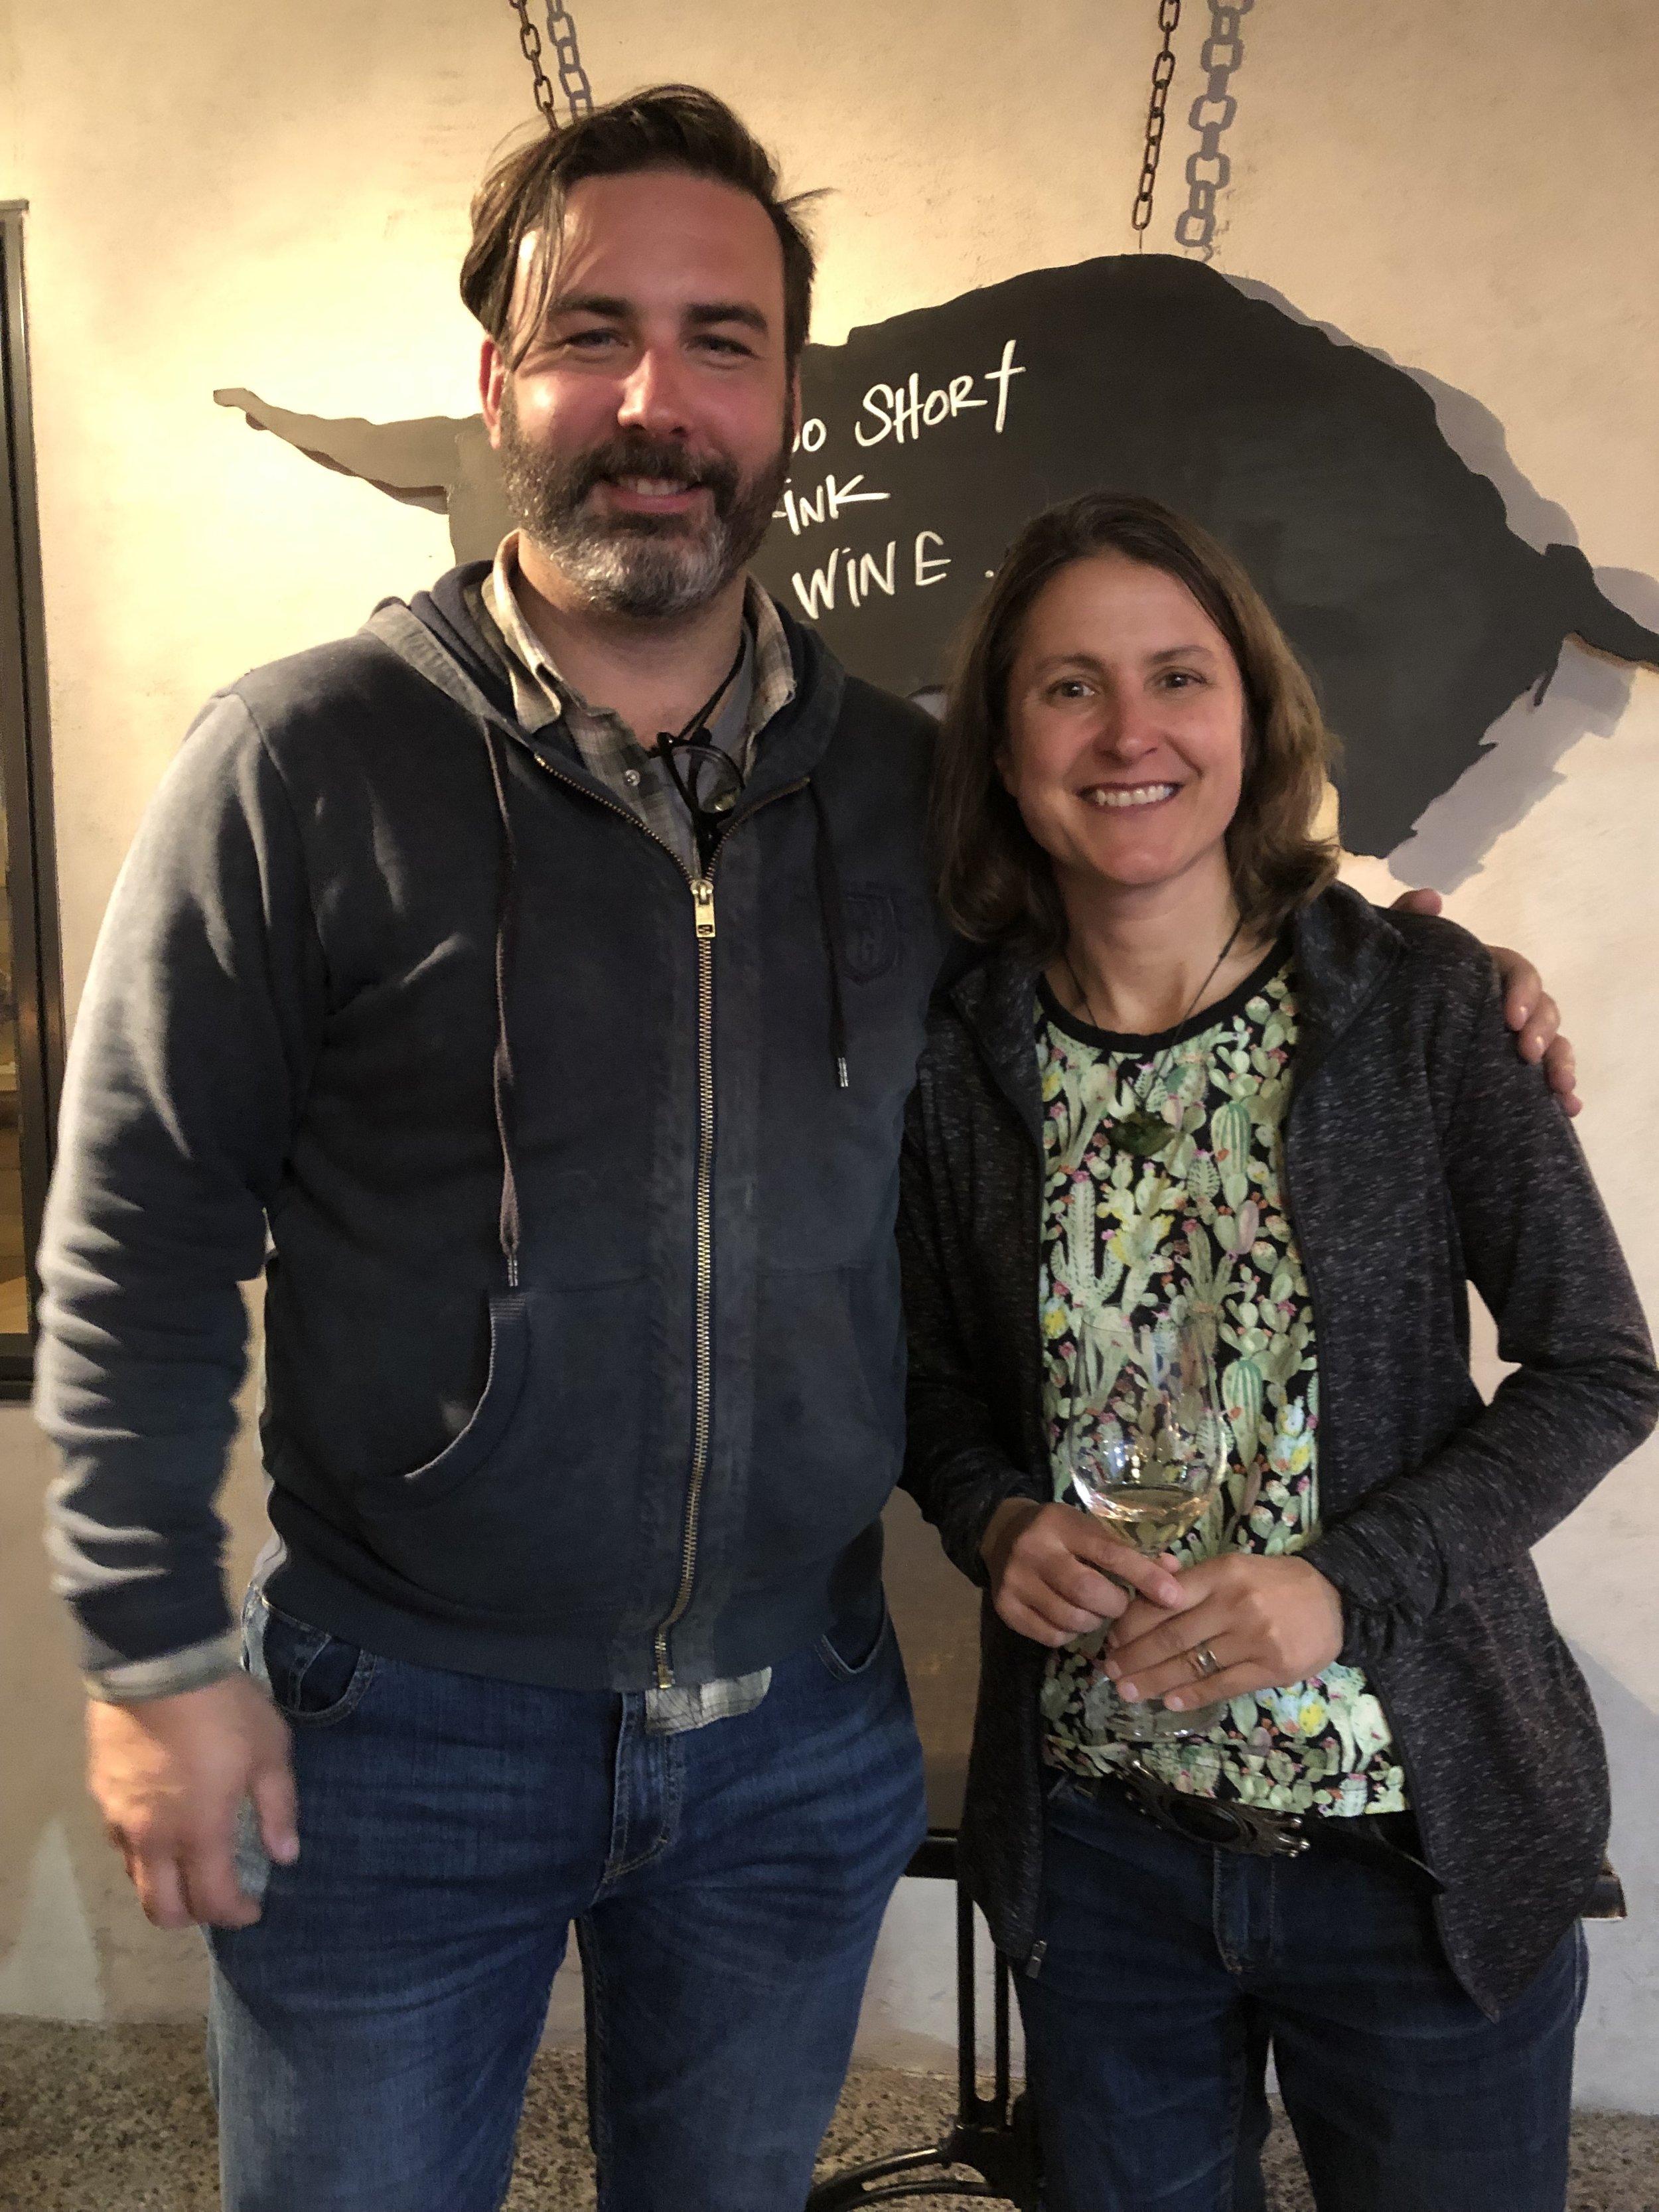 Daniel with Valli Winemaker, Jen Parr